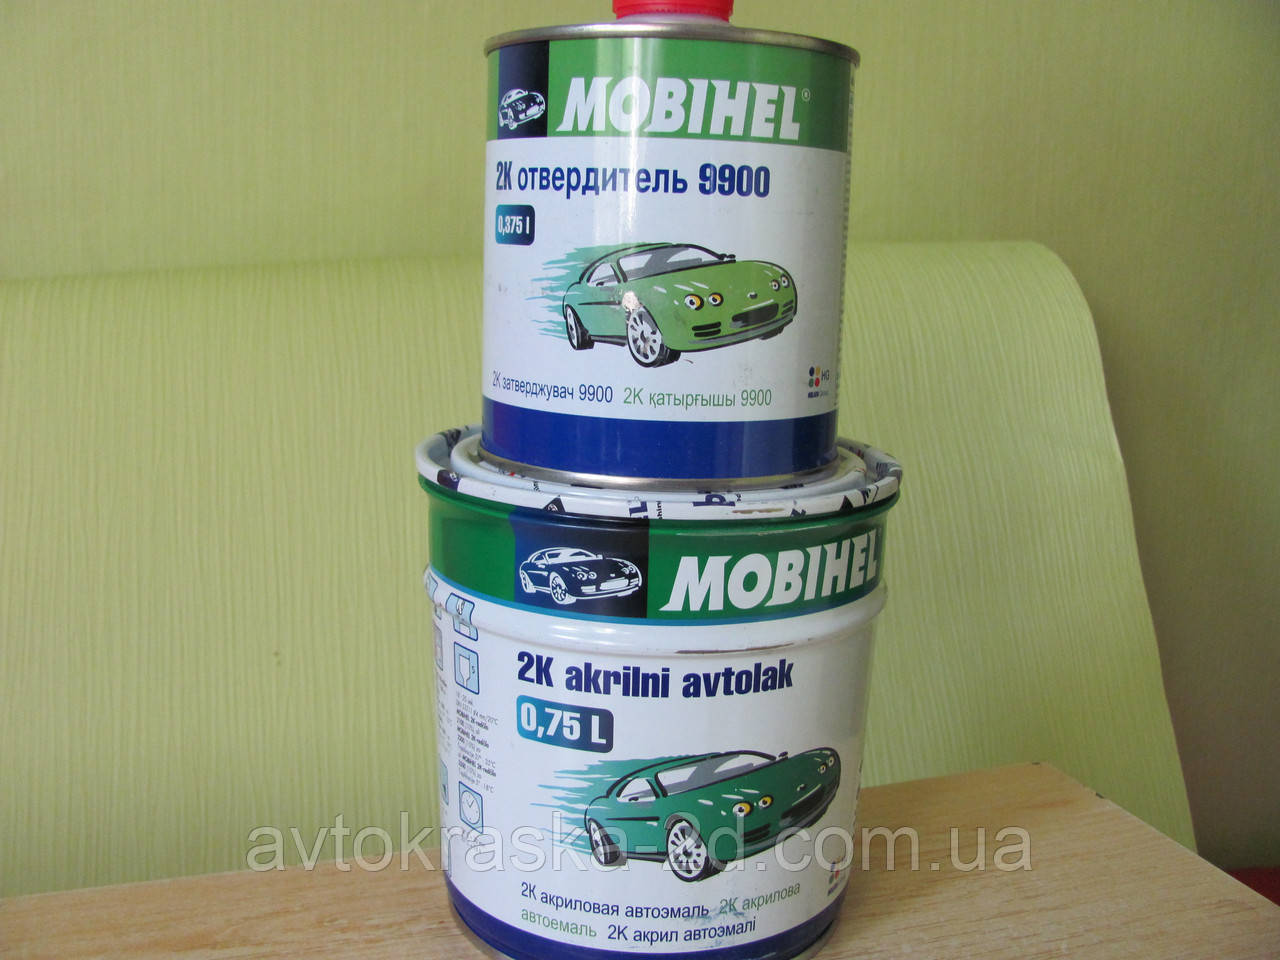 Акрилова автофарба MOBIHEL Балтика № 420 (0,75 л) + затверджувач 9900 0,375 л